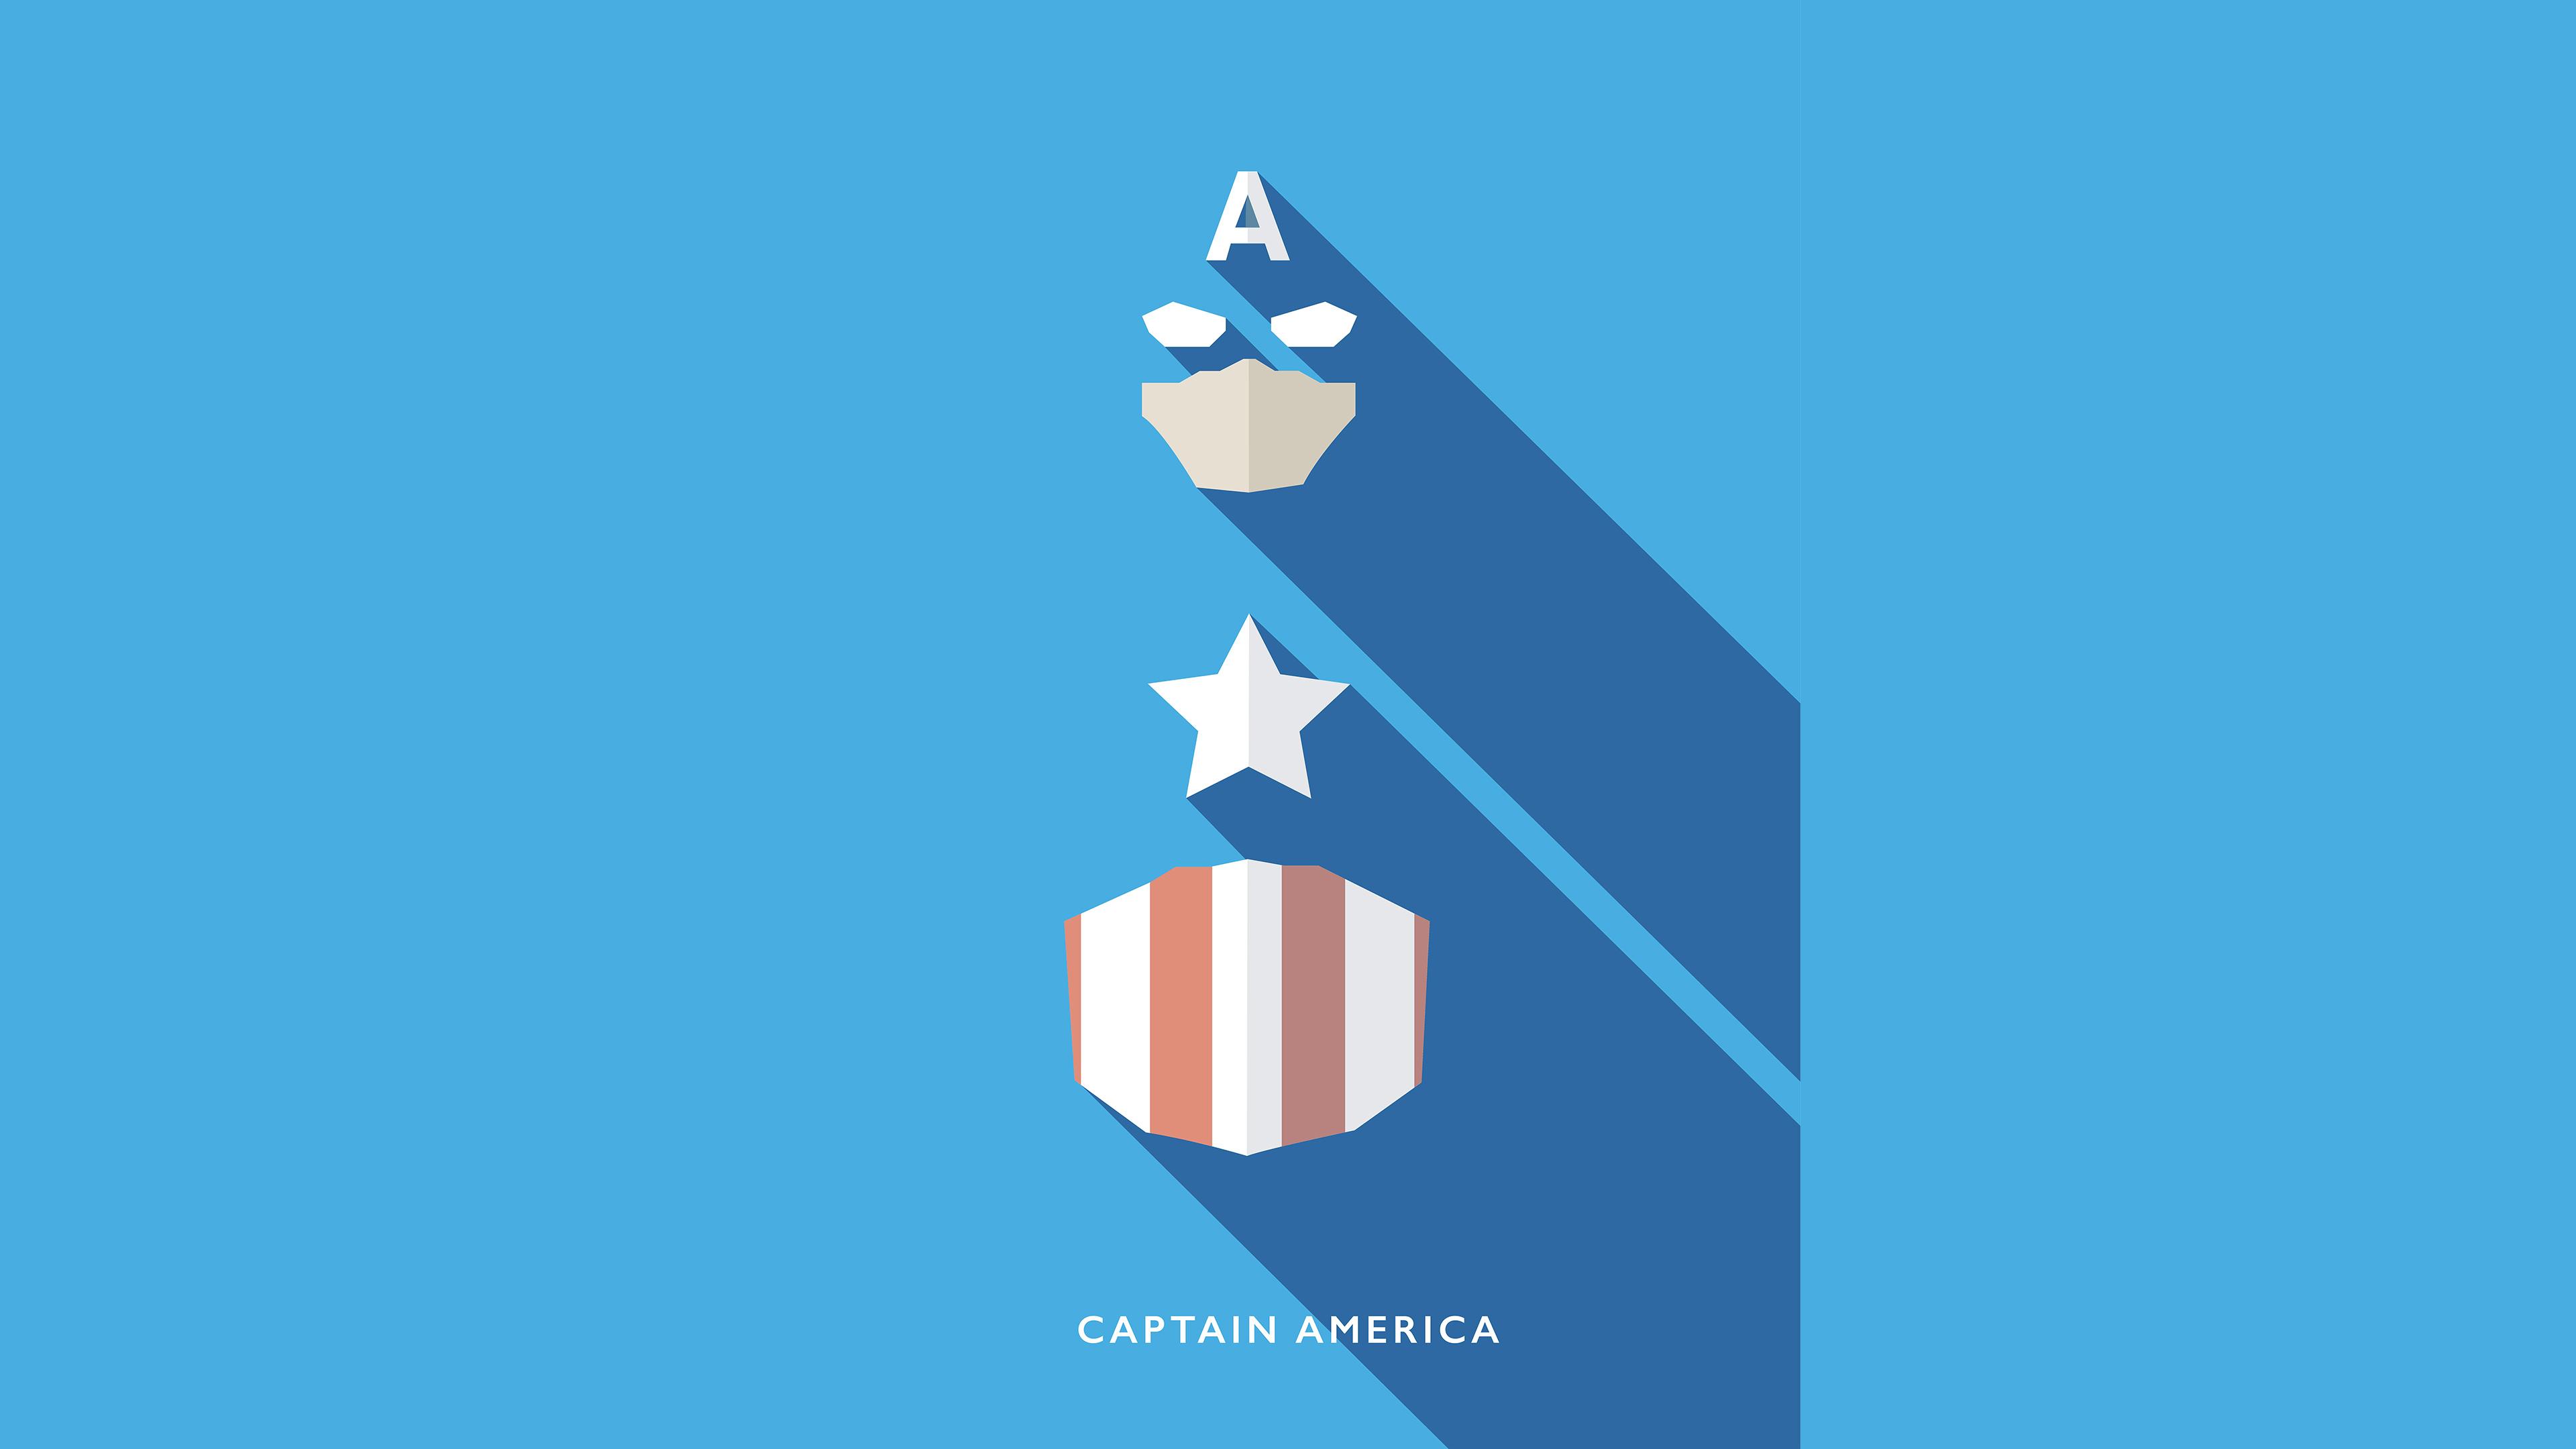 captain america minimalist 4k 1553071264 - Captain America Minimalist 4k - superheroes wallpapers, minimalist wallpapers, minimalism wallpapers, hd-wallpapers, digital art wallpapers, captain america wallpapers, behance wallpapers, artwork wallpapers, artist wallpapers, 4k-wallpapers